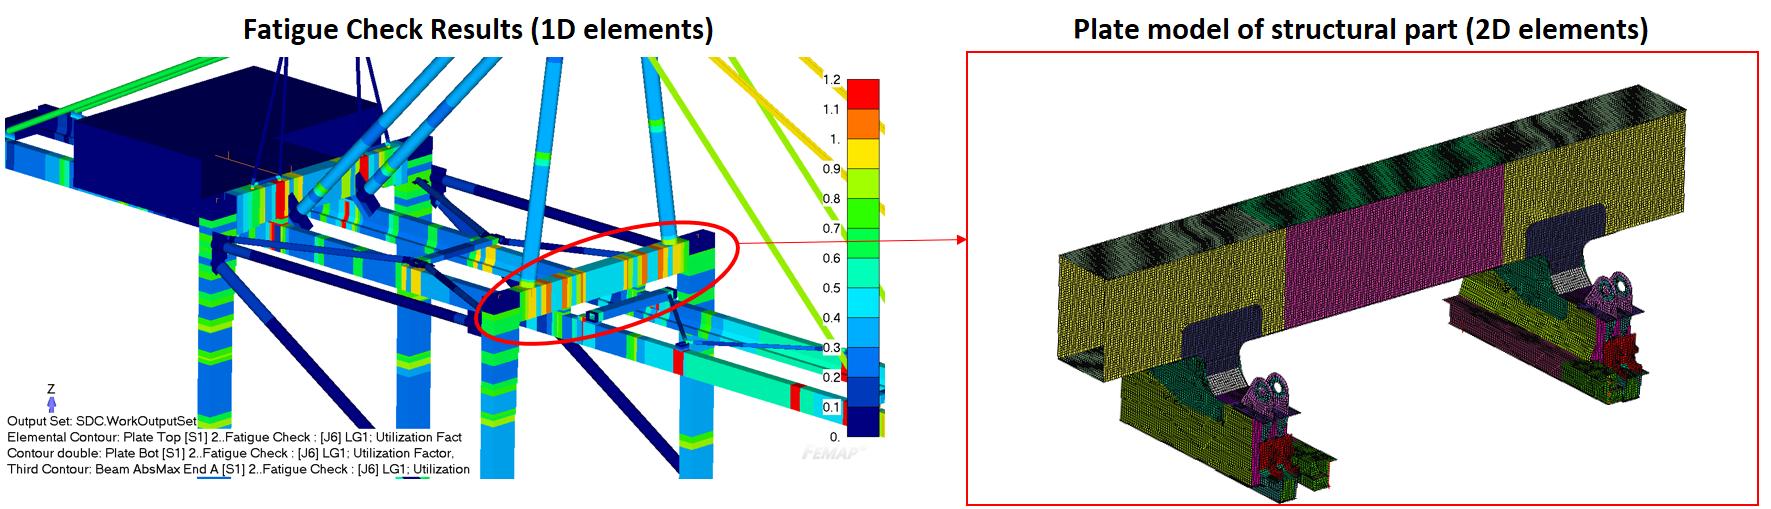 Plate model of structural part (2D elements)